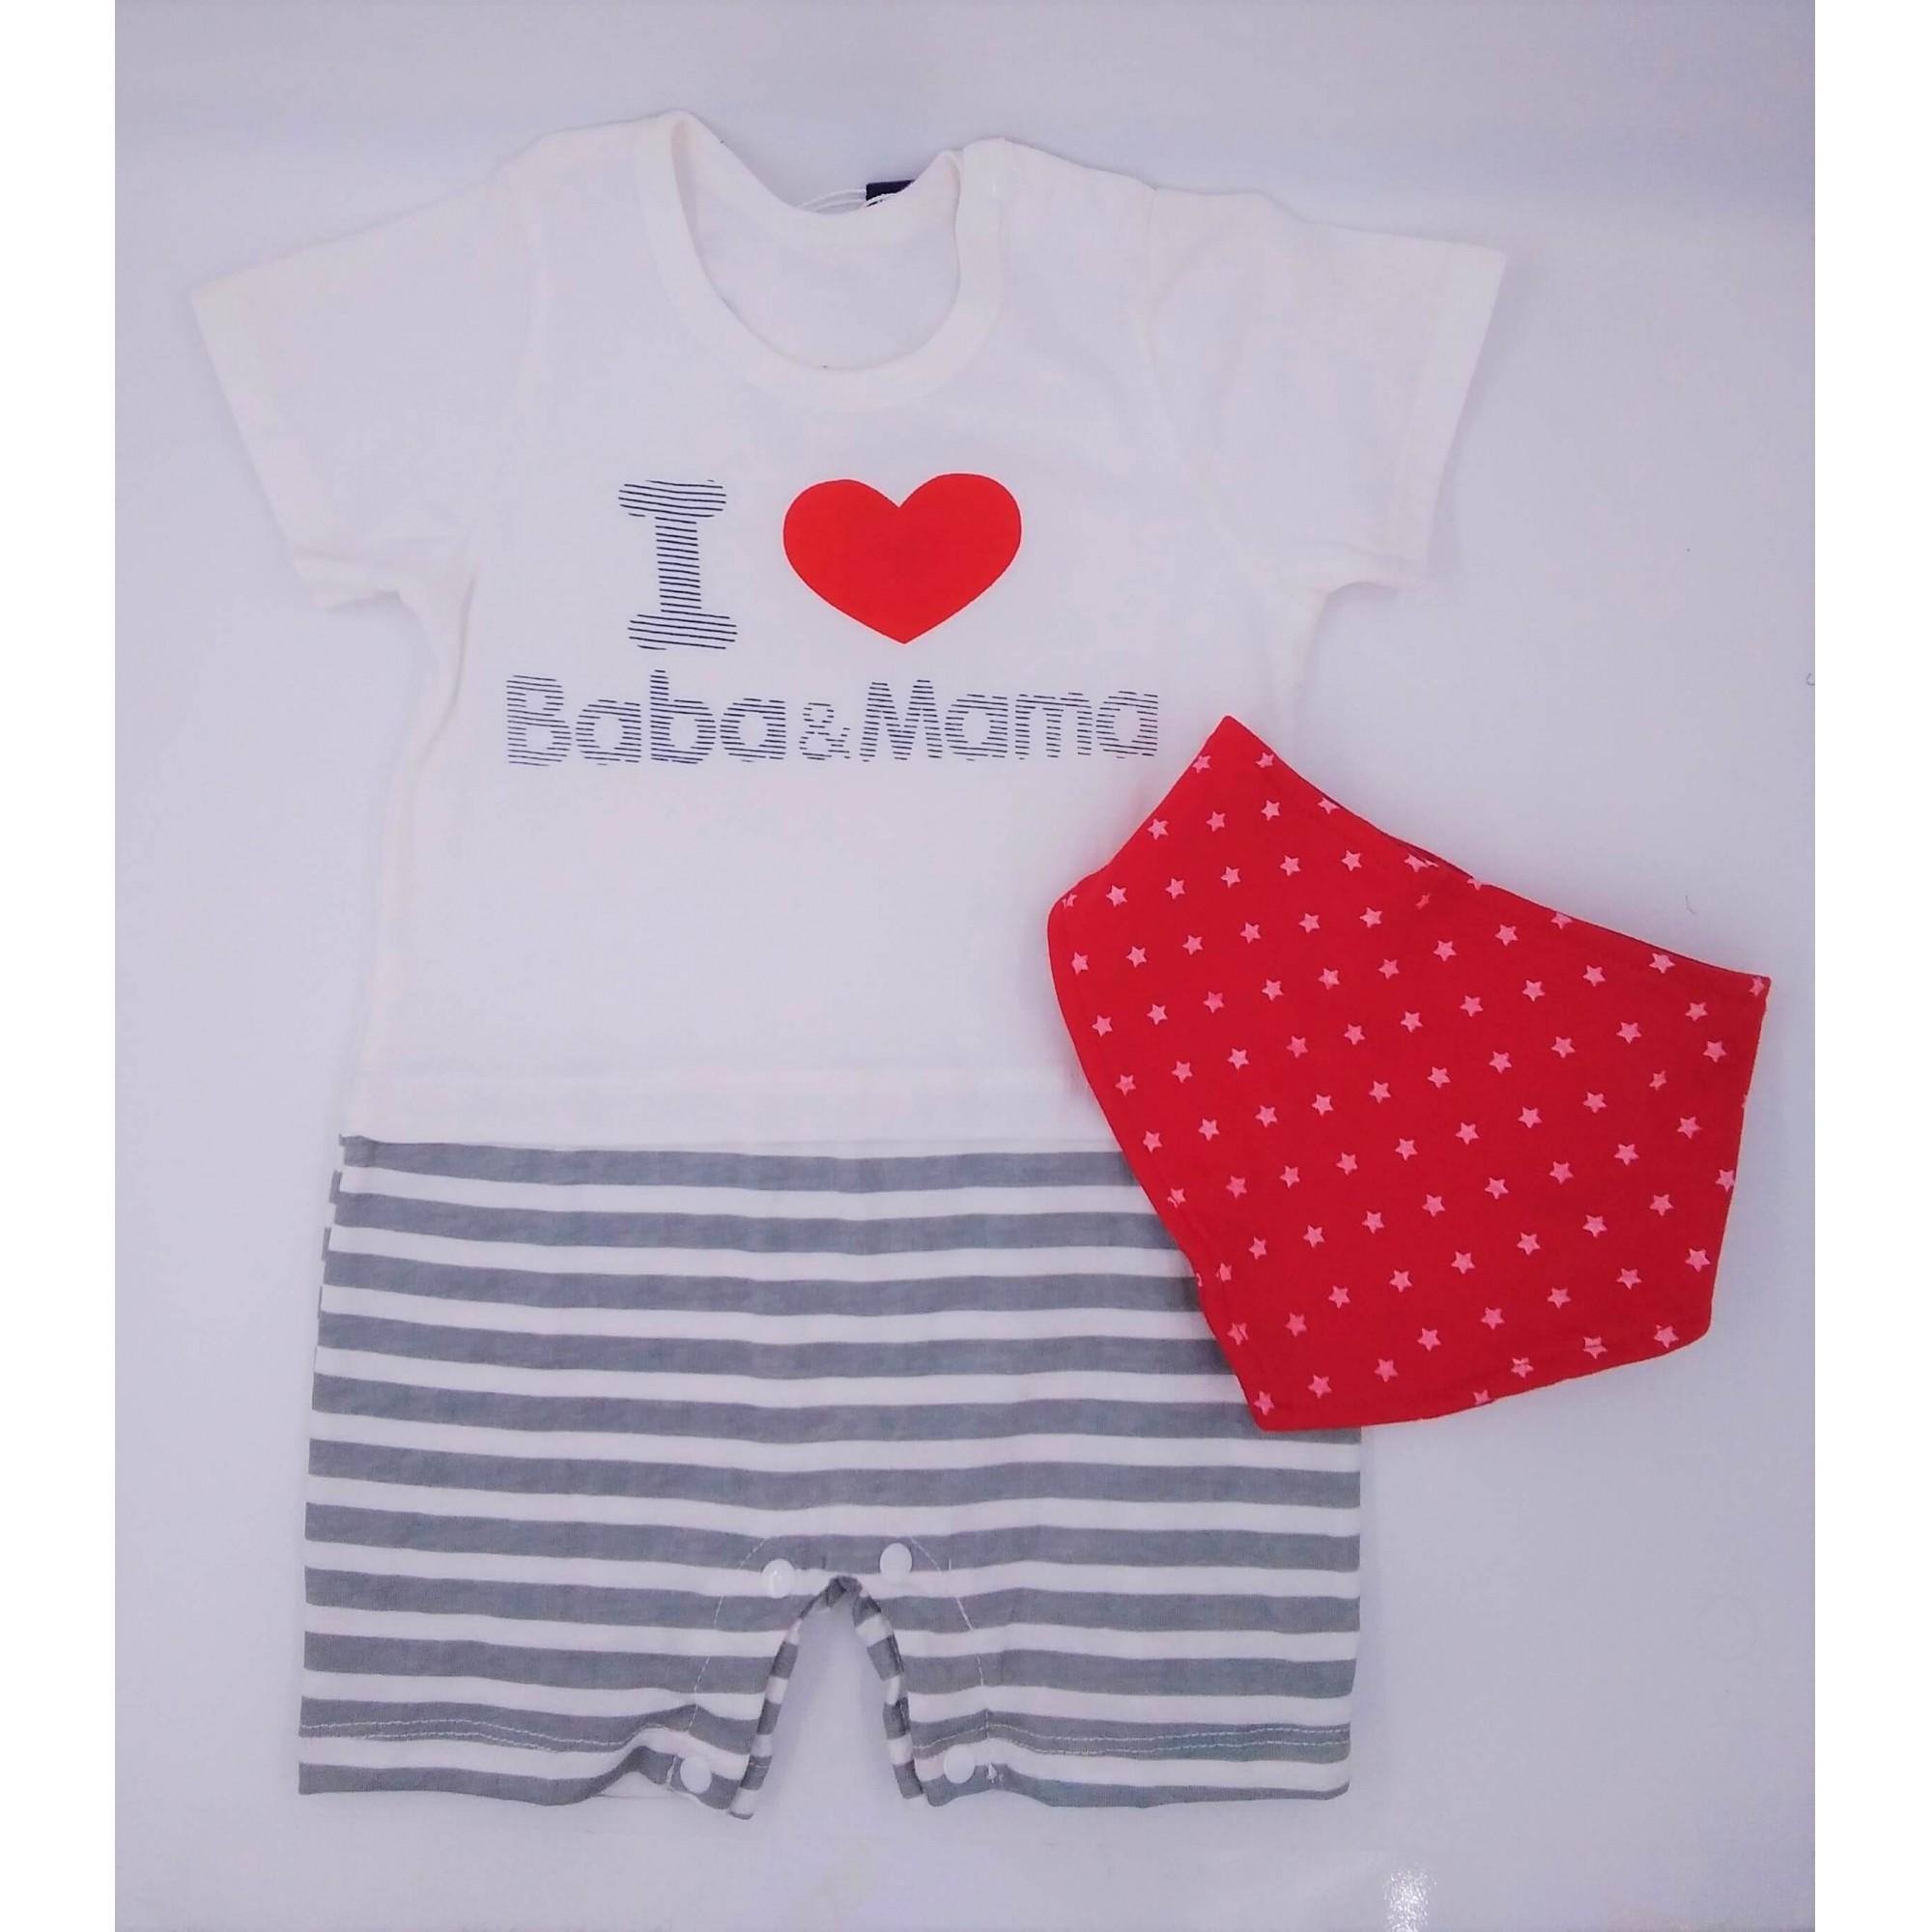 Romper Banho de Sol I Love Baba & Mama com babador Yier Ying